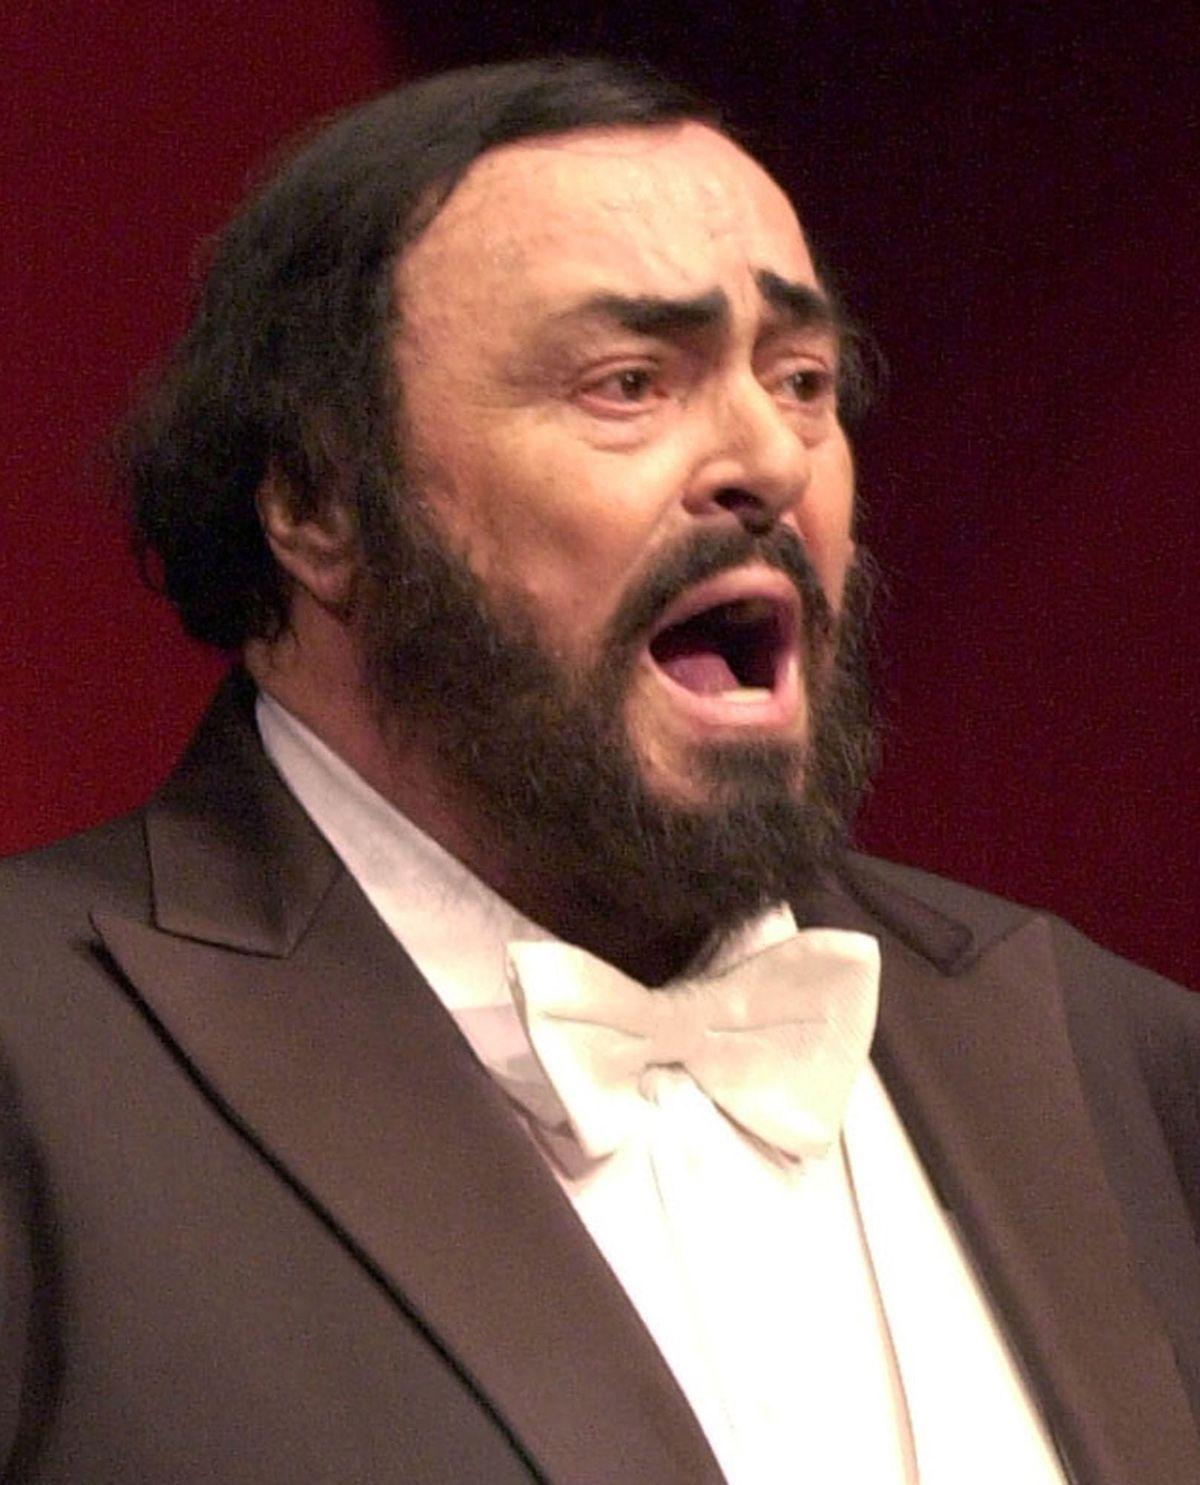 Nam danh ca Luciano Pavarotti